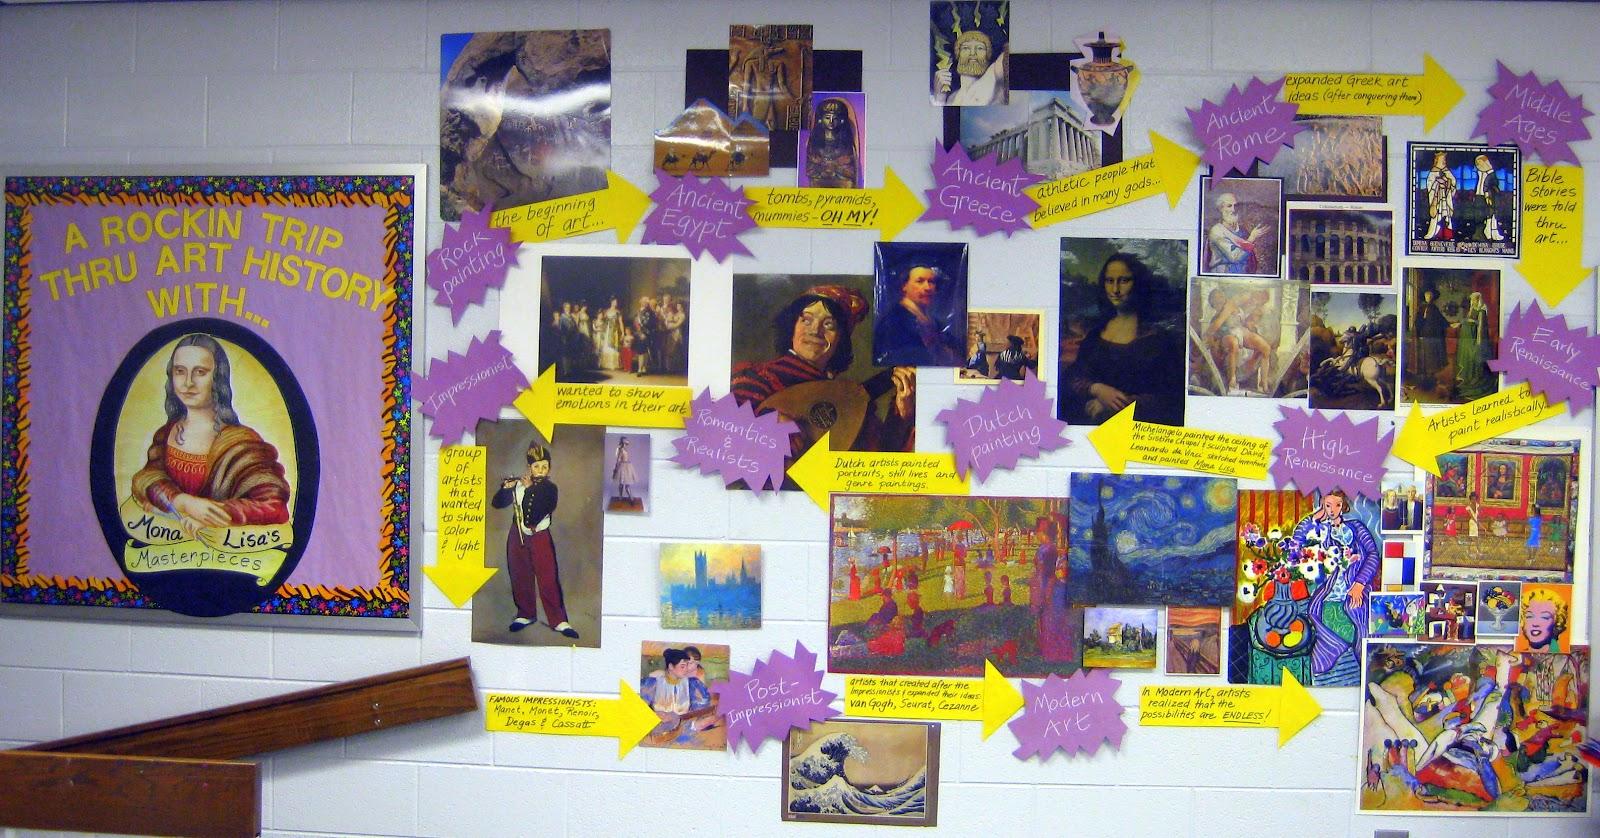 A Rockin Trip Thru Art History WithMona Lisas Masterpieces